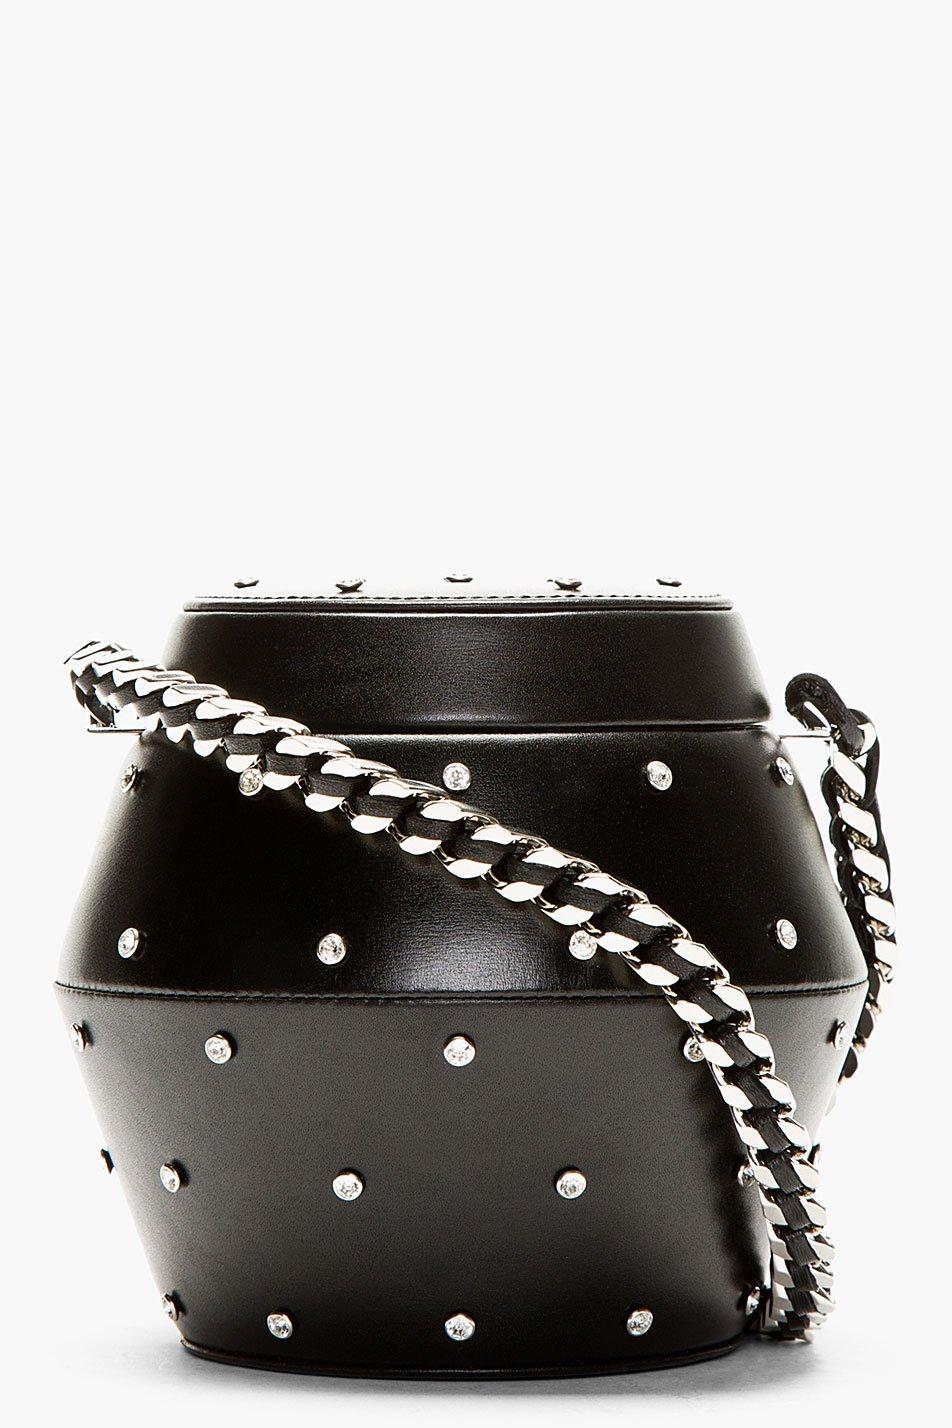 Saint Laurent Black Leather Studded Minaudiere Canister Bag